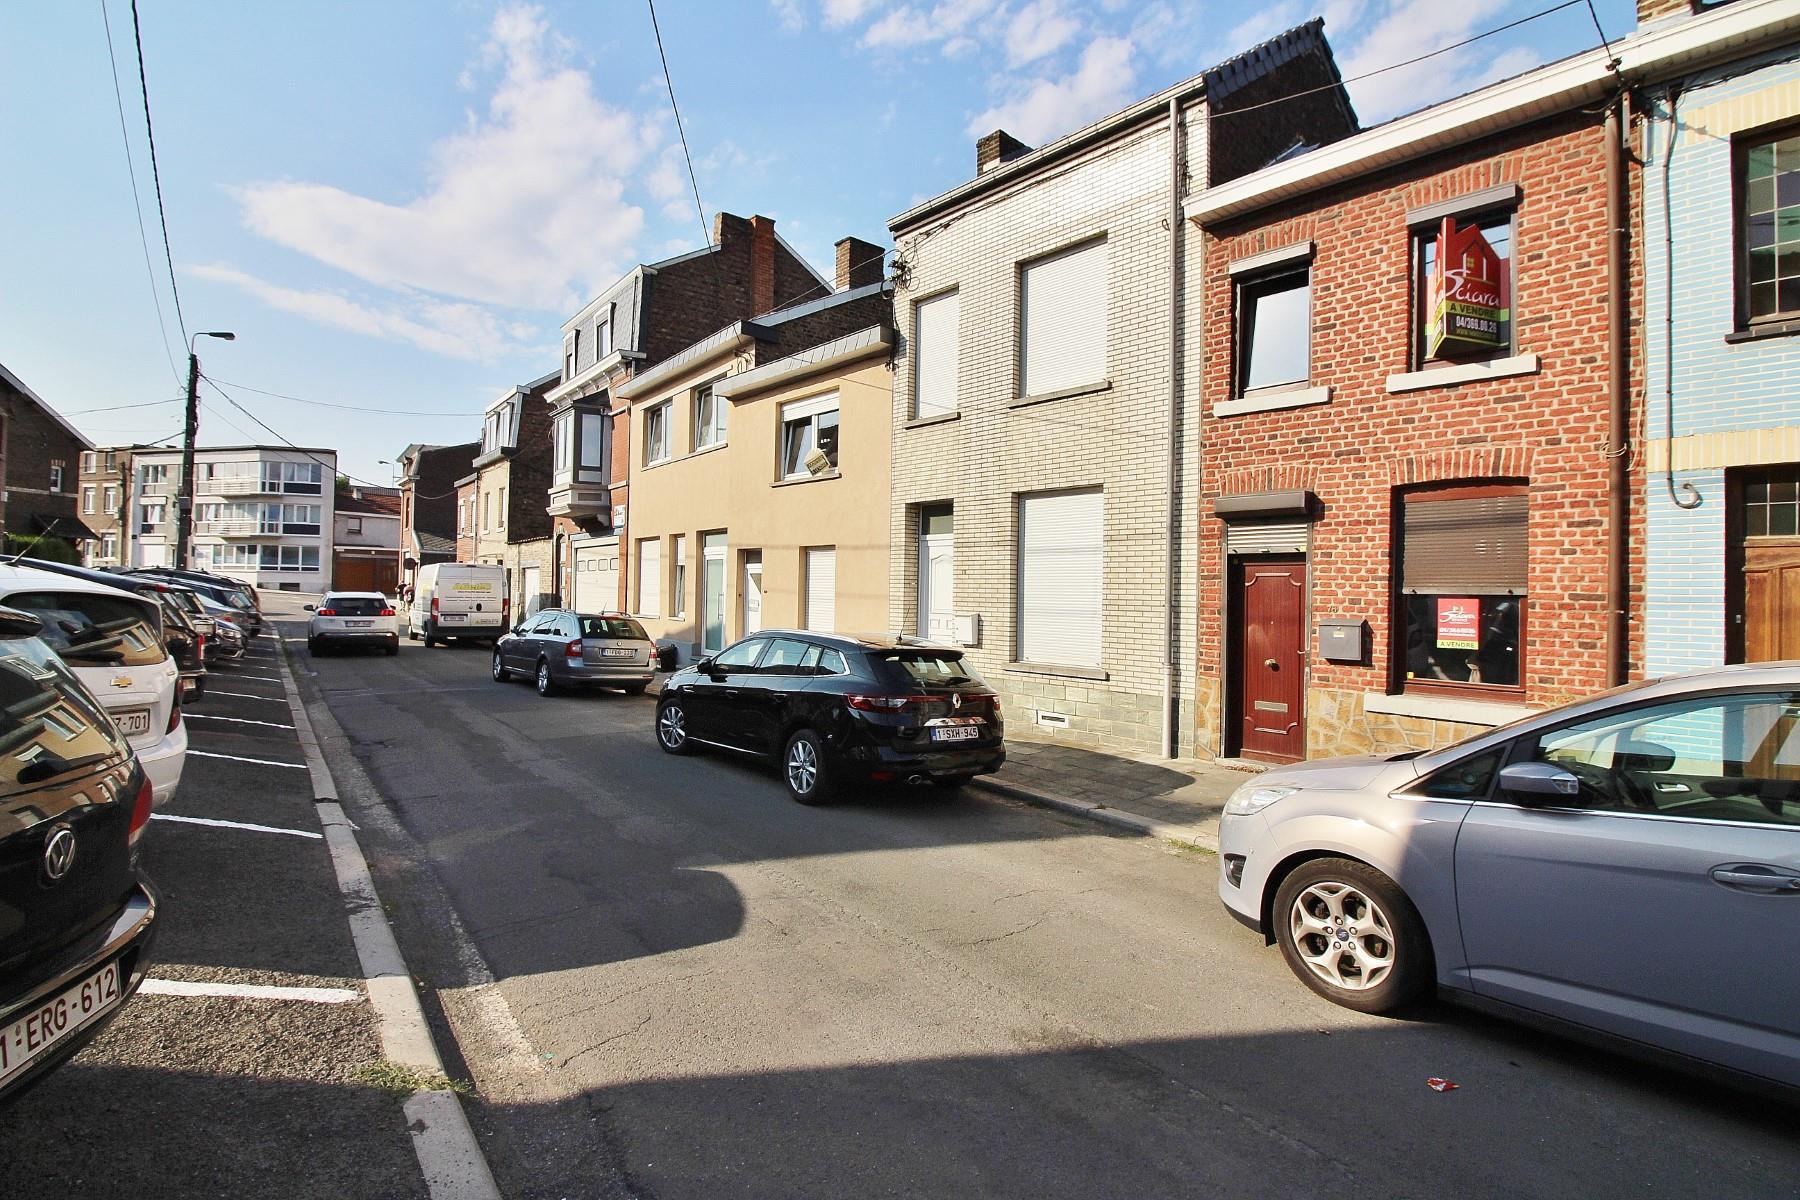 Maison - Seraing Jemeppesur-Meuse - #3539725-14